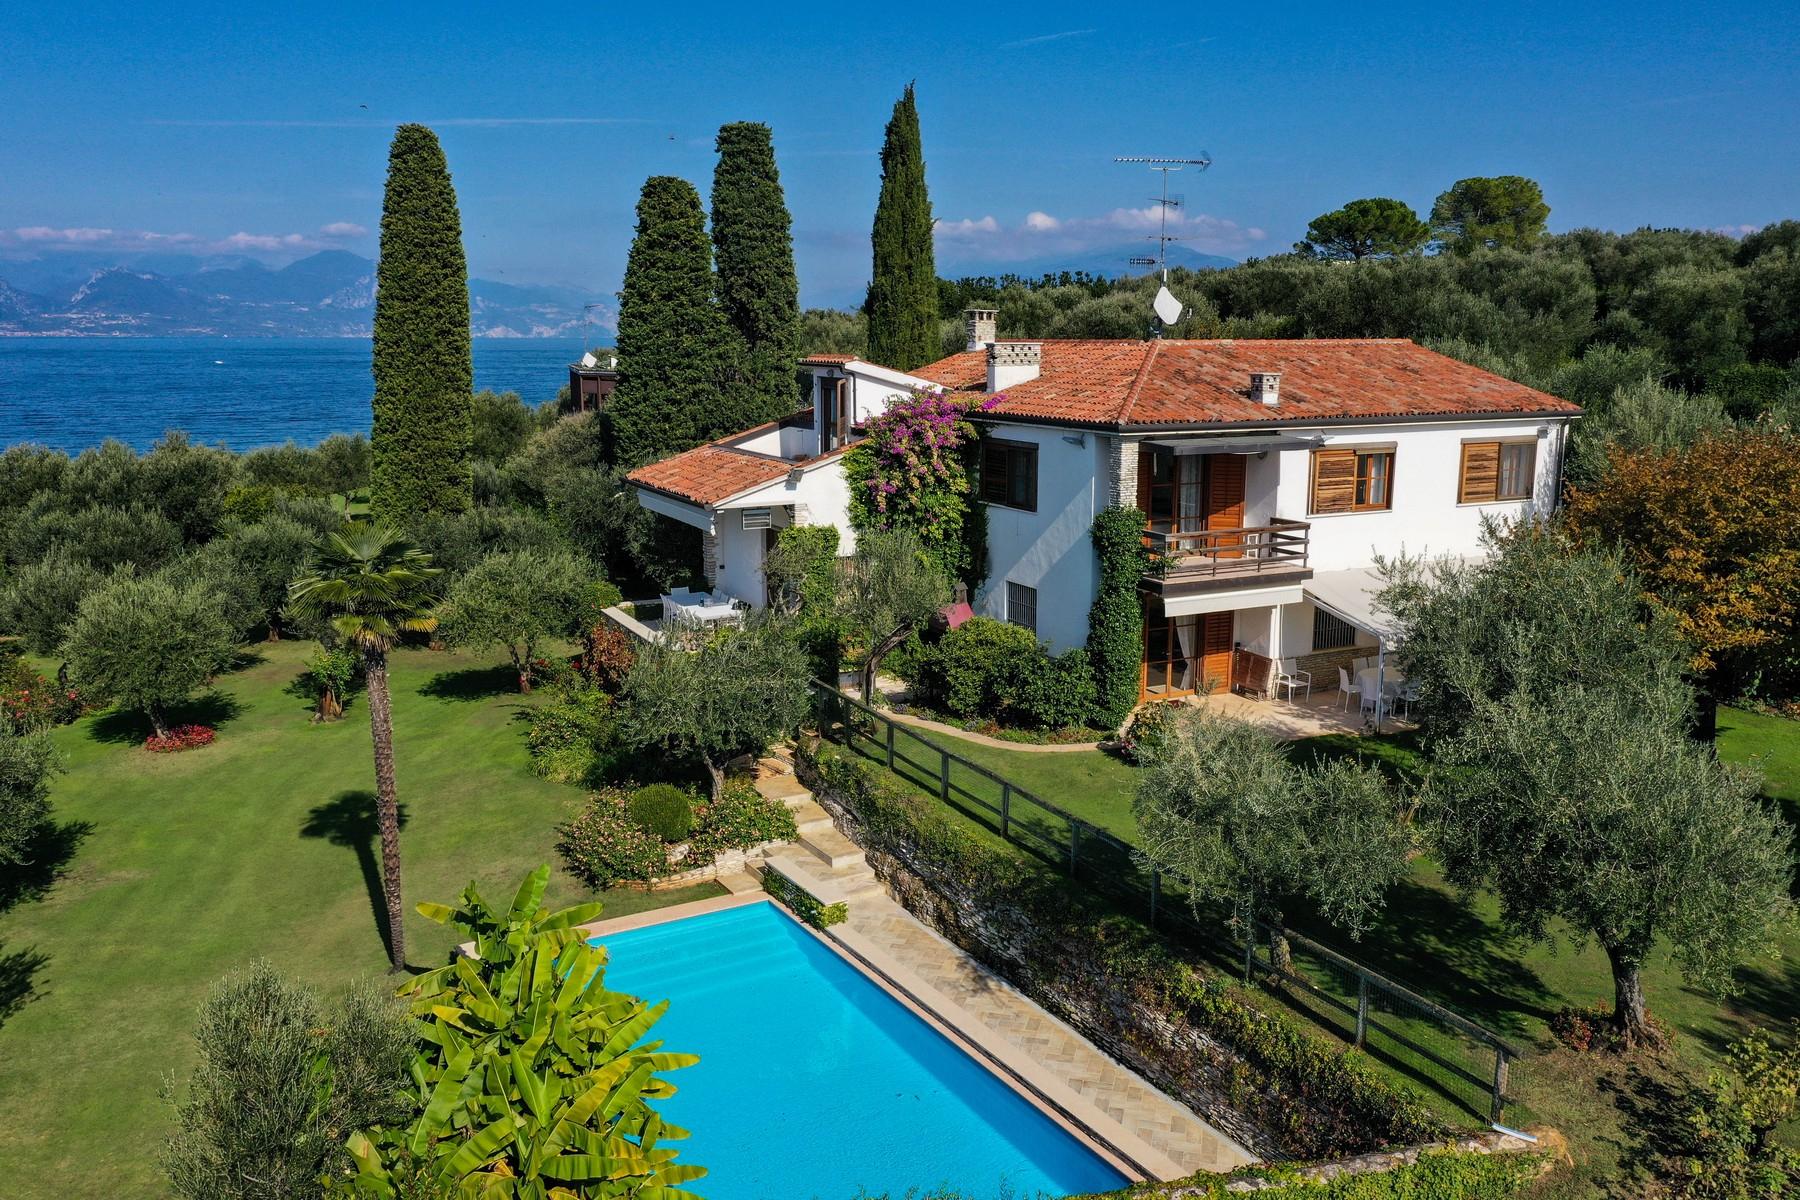 Villa in Vendita a Sirmione: 5 locali, 500 mq - Foto 28